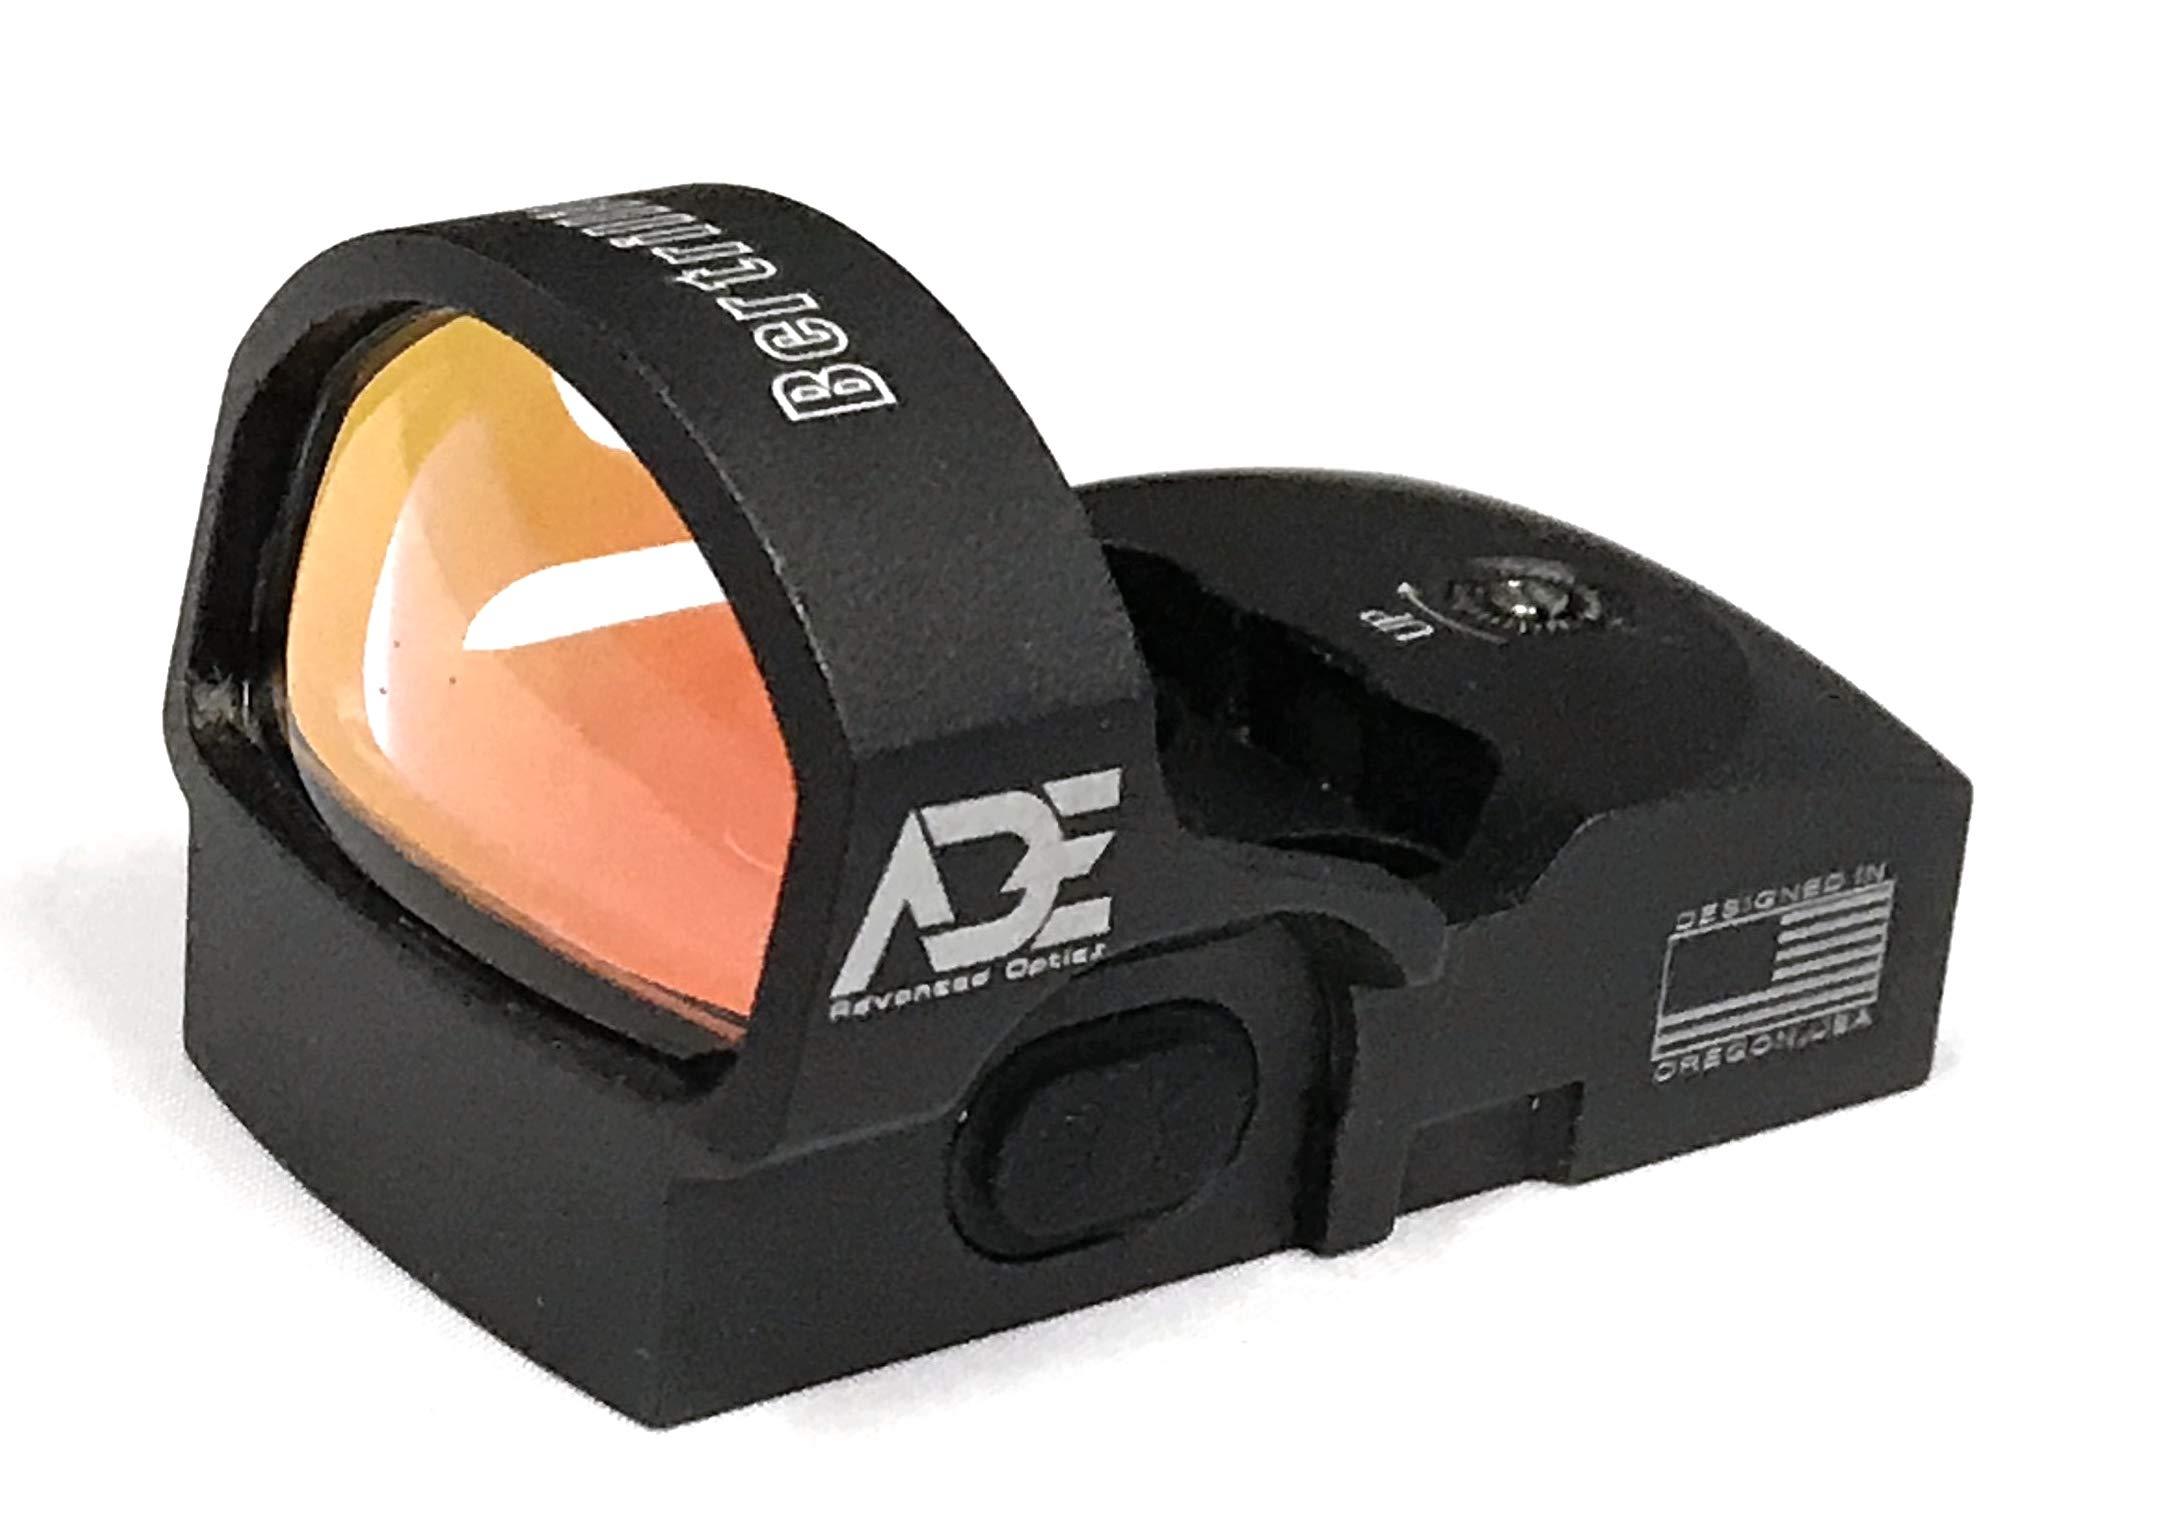 Ade Advanced Optics Bertrillium RD3-013 Red Dot Reflex Sight for Ruger SR9,SR9C,SR40C,SR40,SR45 Pistol by Ade Advanced Optics